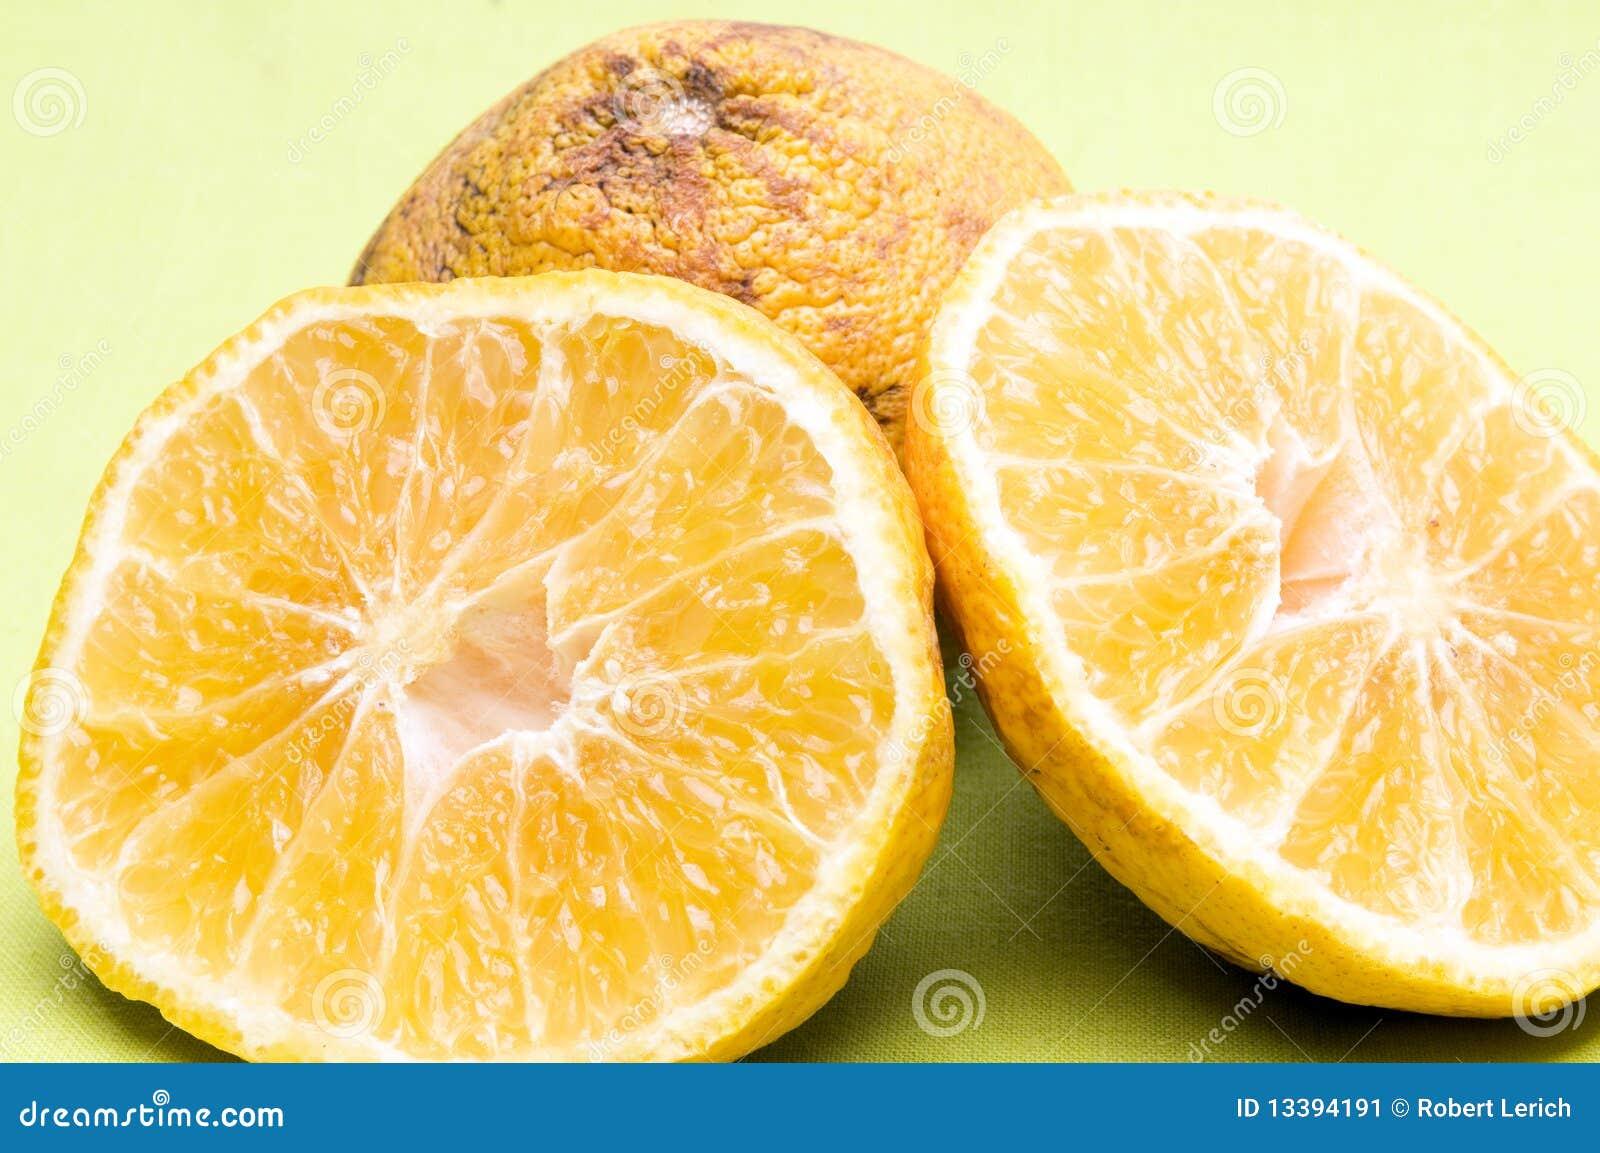 Ugli Fruits From Jamaica